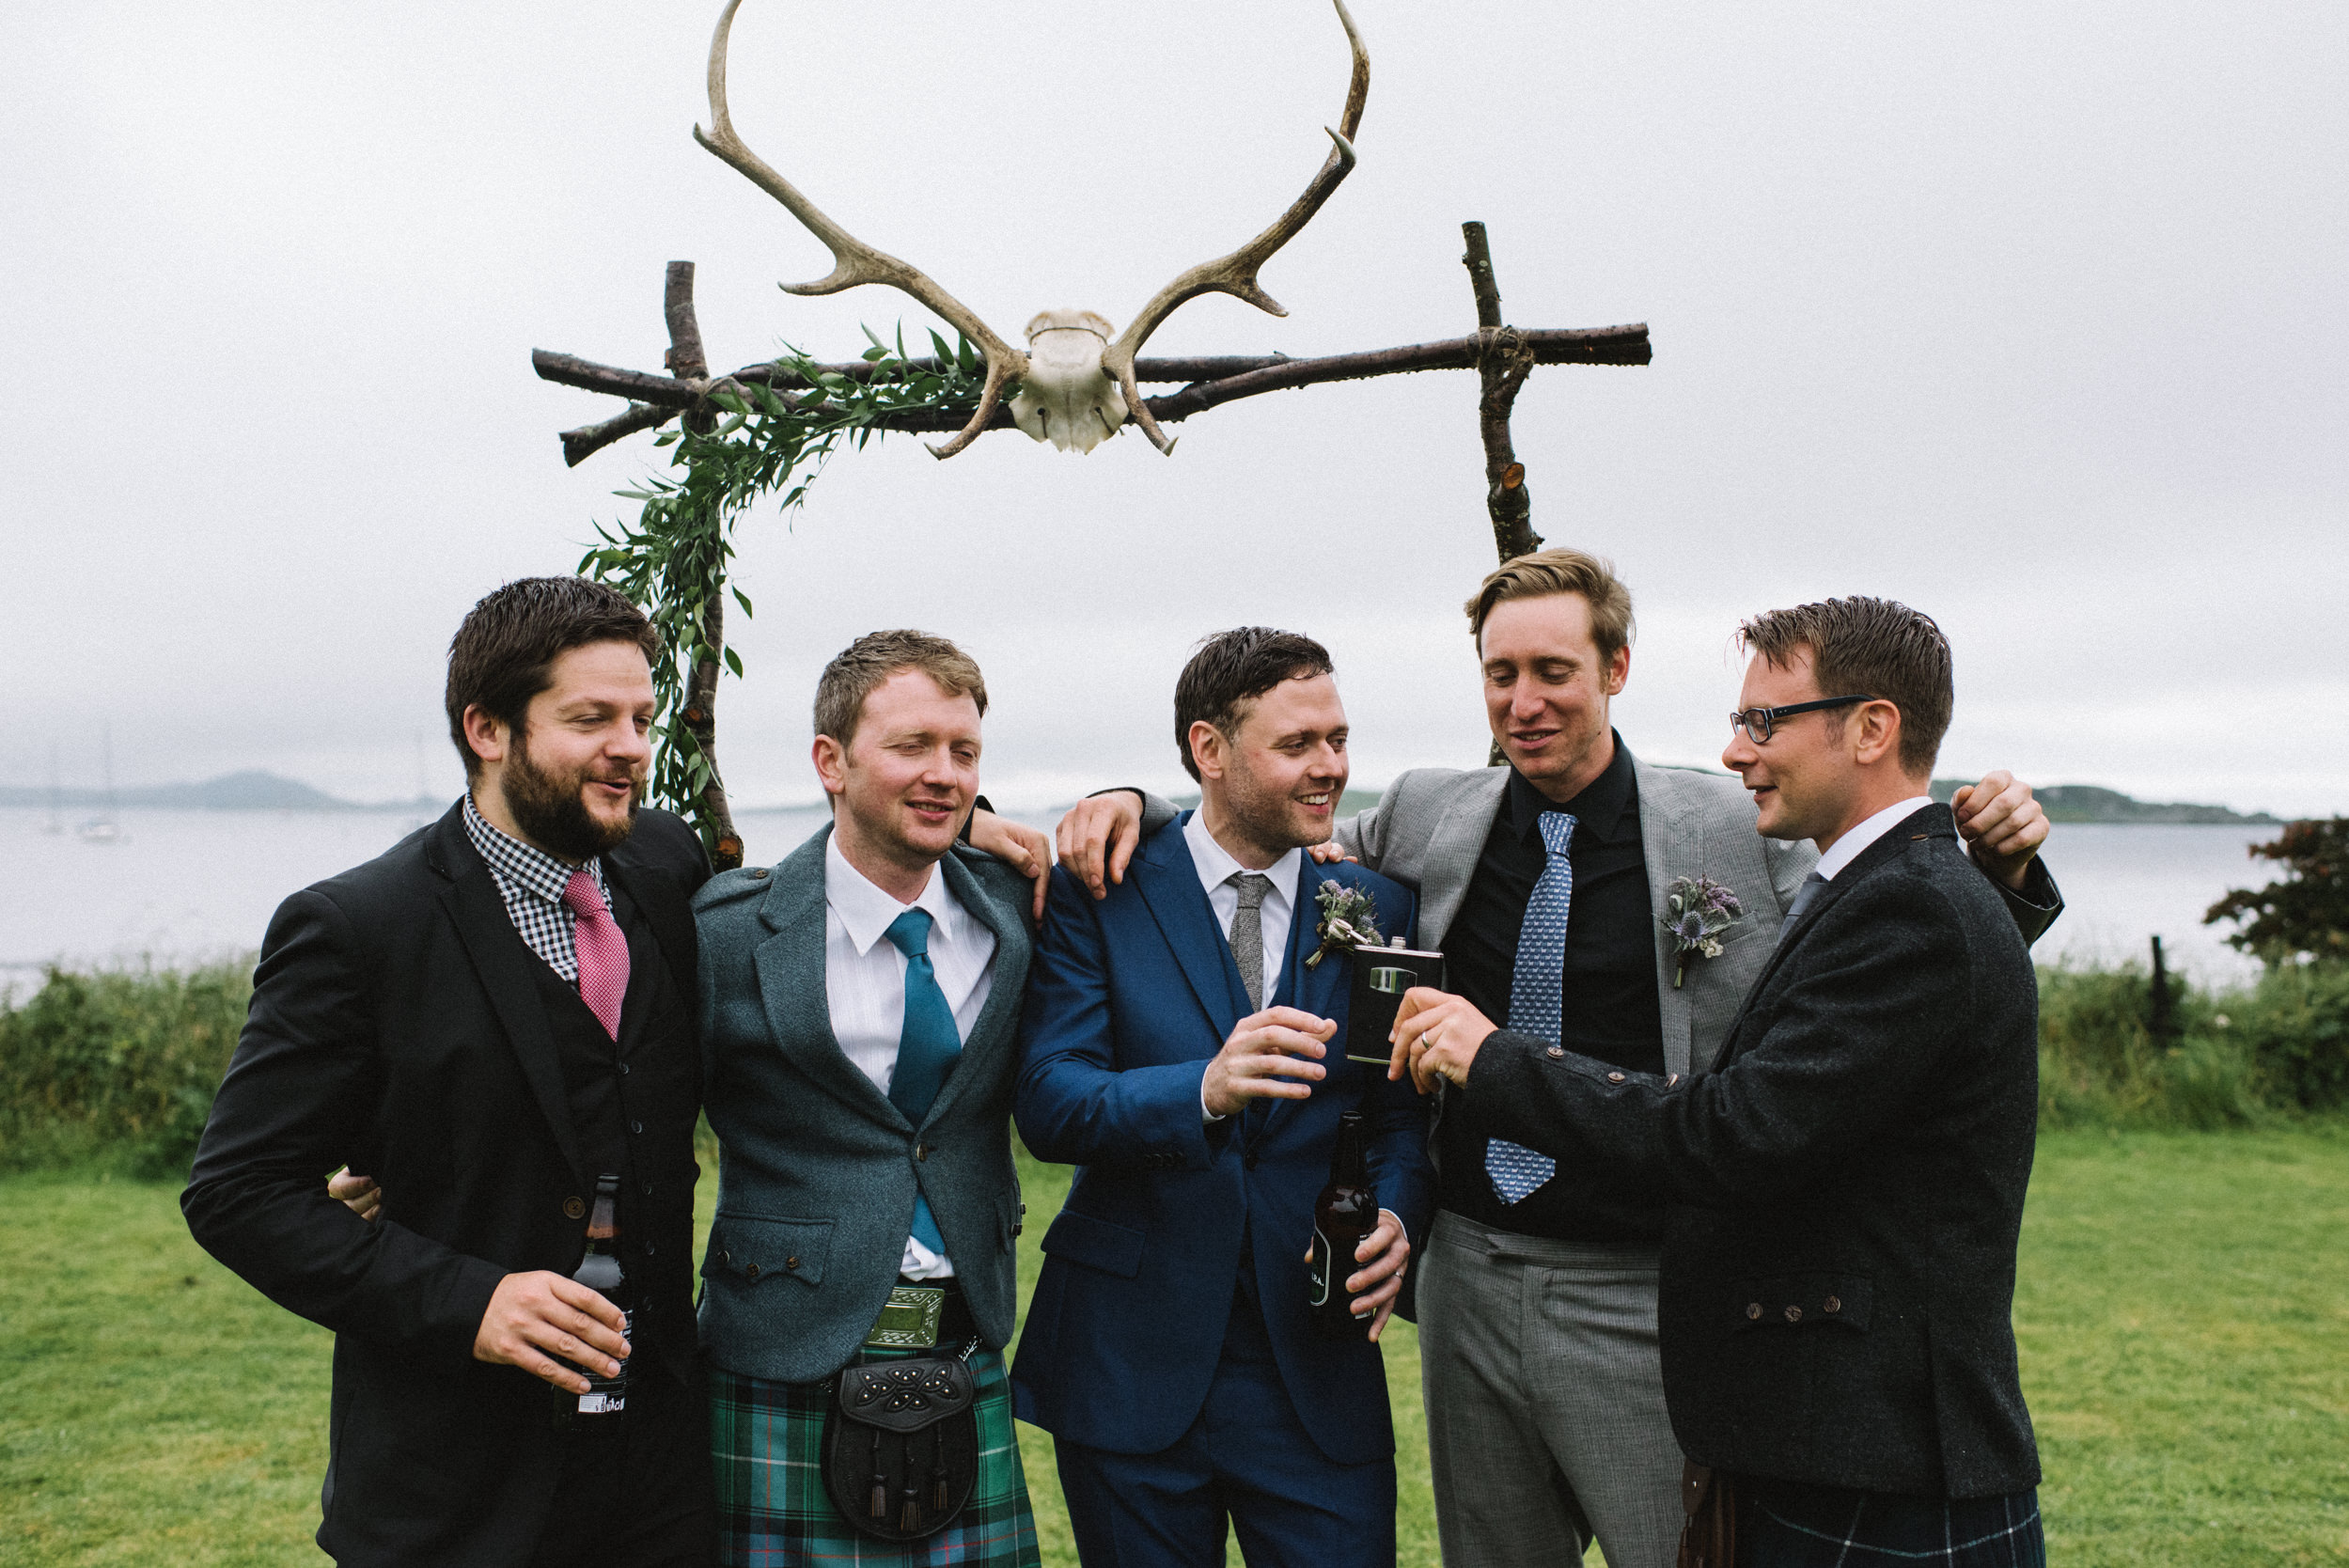 0085-alternative-wedding-portrait-family-kids-photographer-glasgow-scotland.JPG